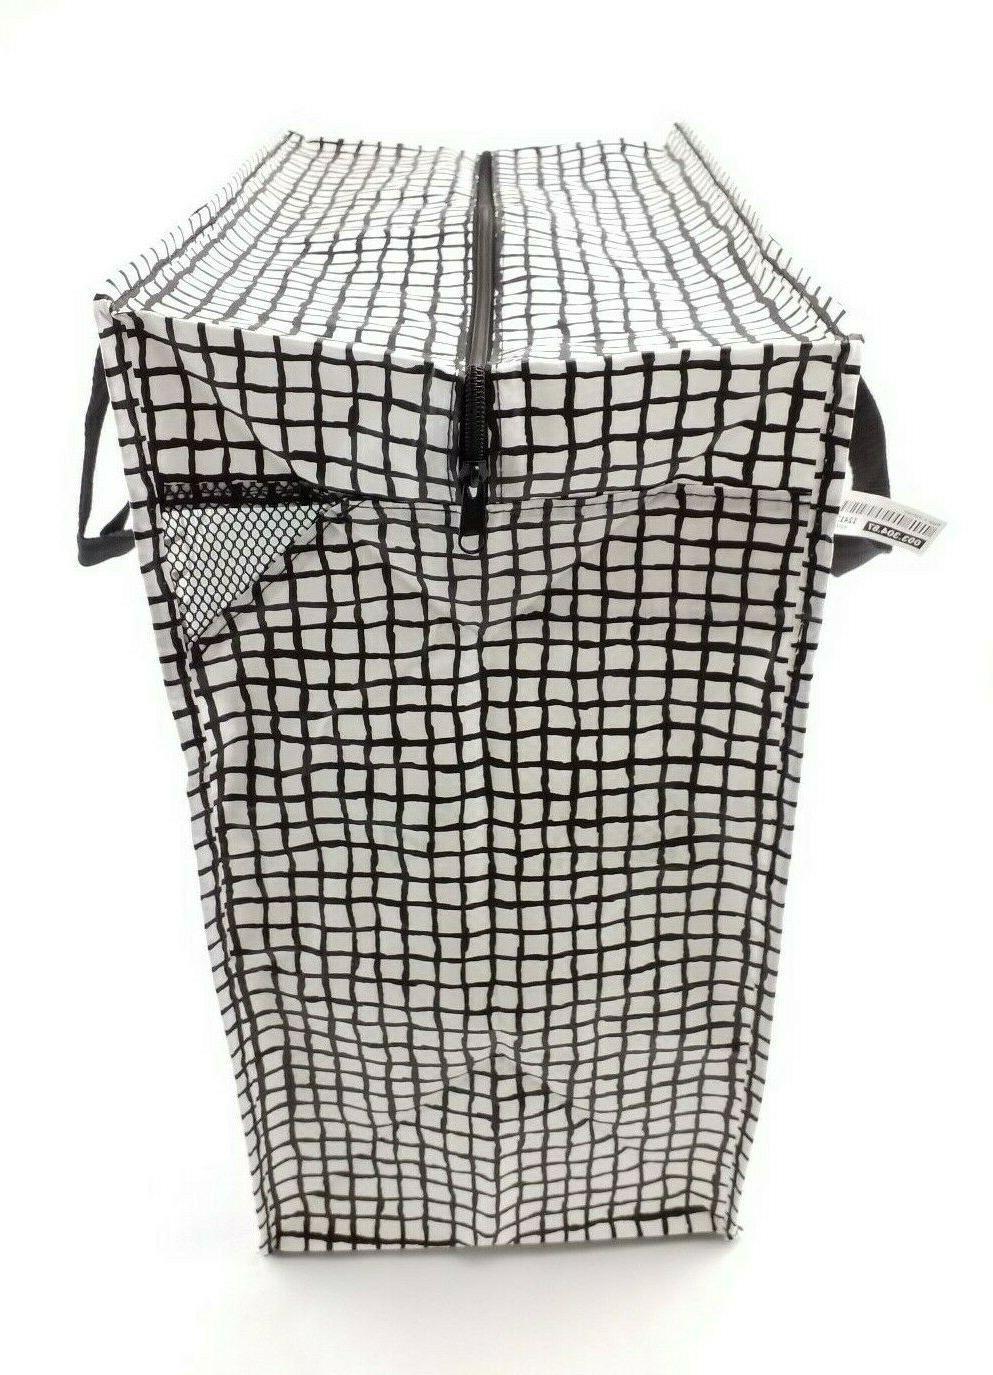 IKEA Shopping Bag White Tote Reusable 12 capacity